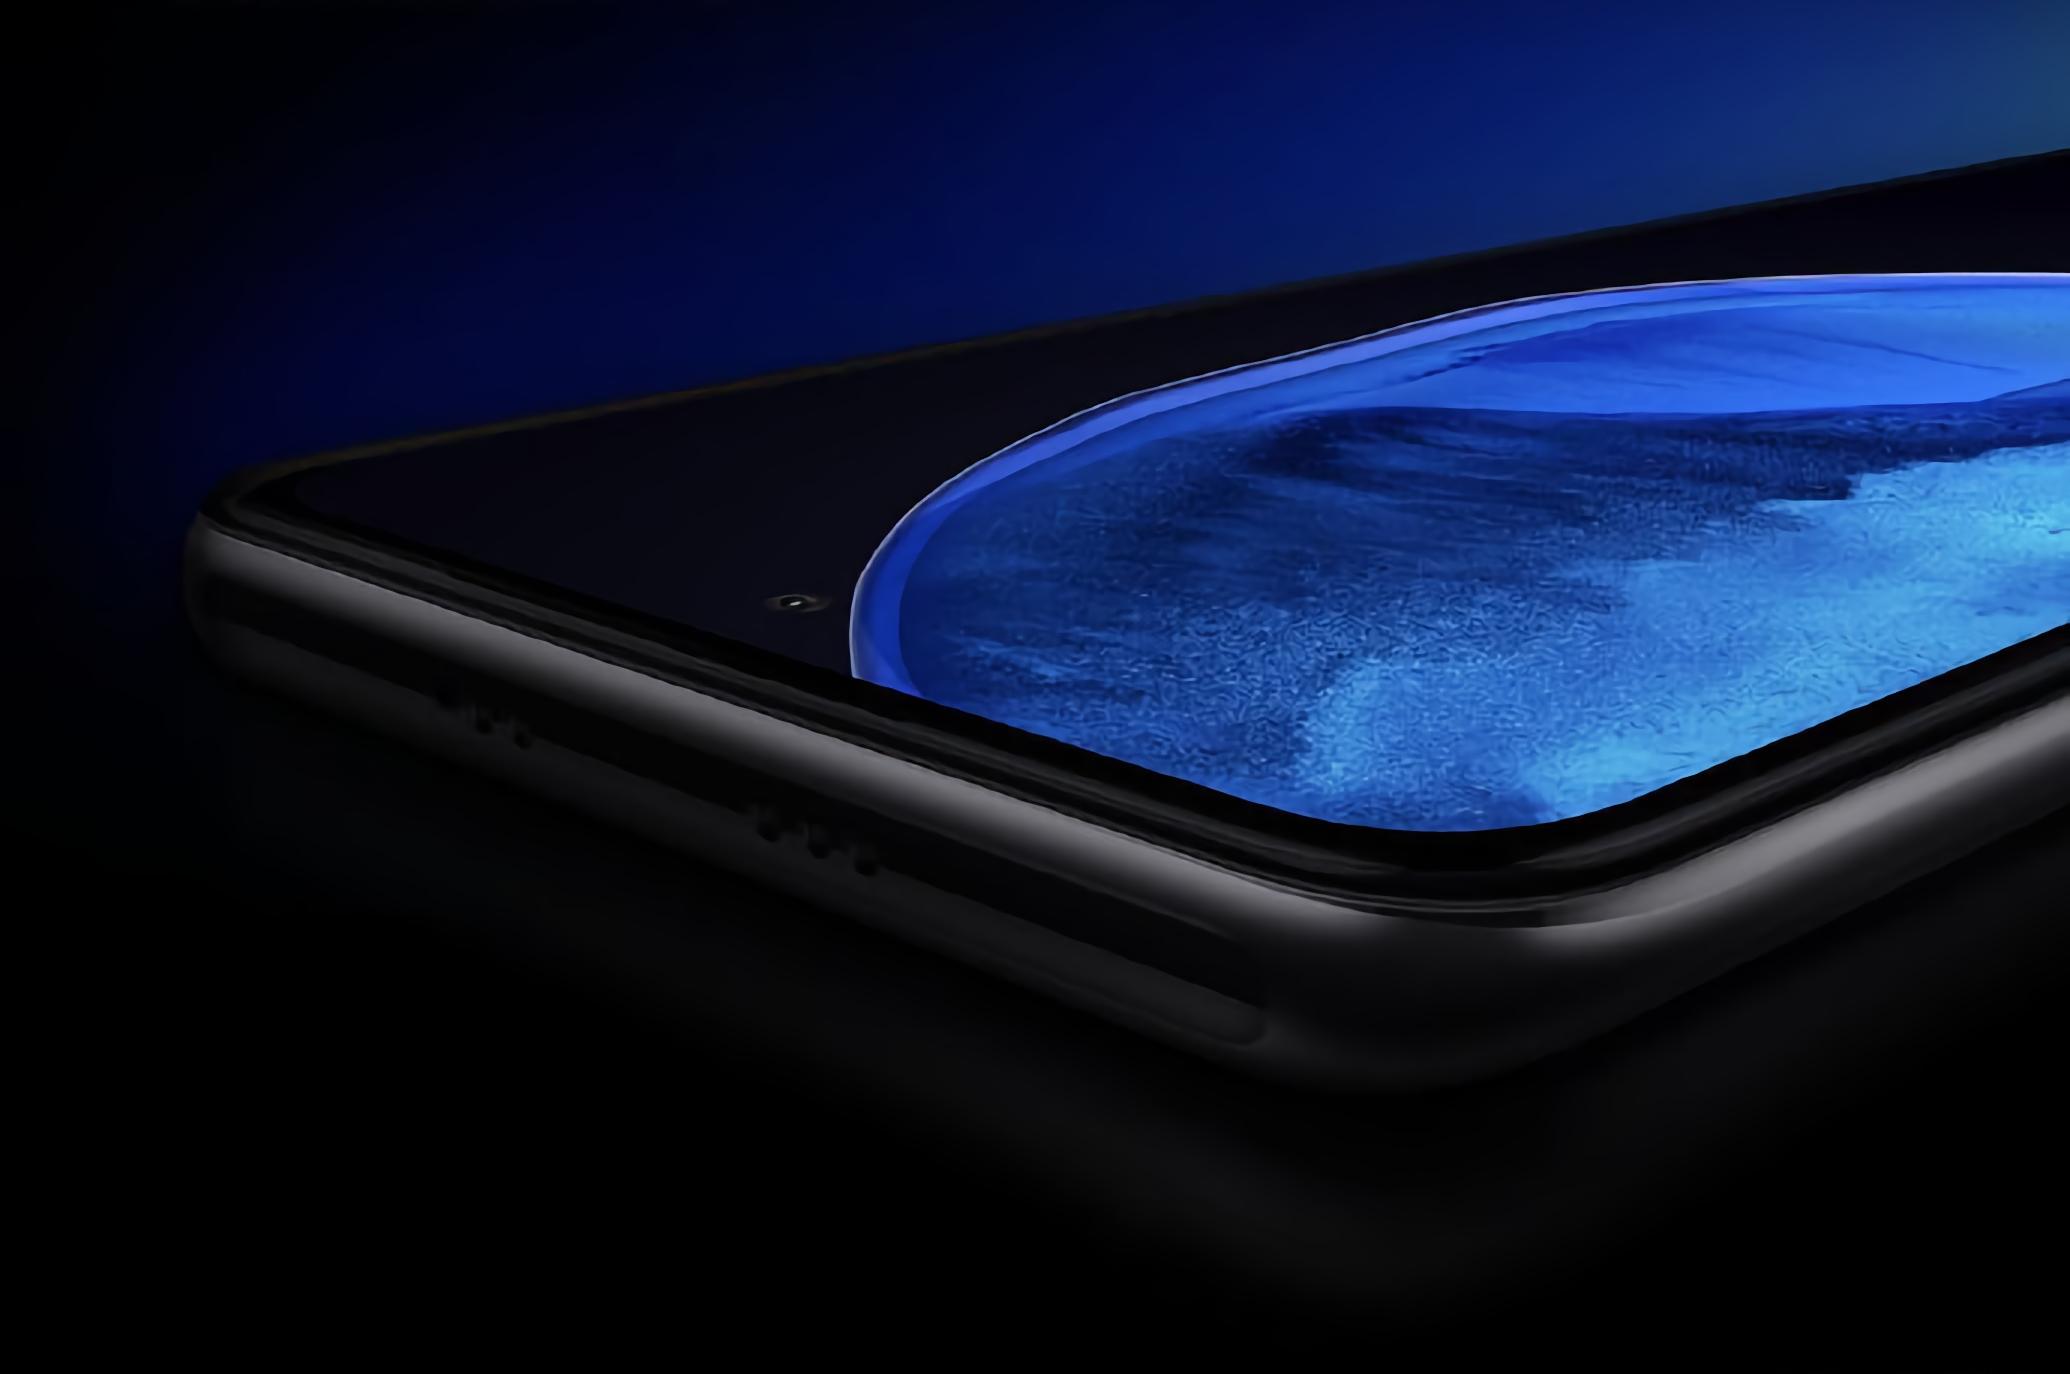 Xiaomi раскрыла характеристики дисплеев Redmi K40 и Redmi K40 Pro: плоские OLED-панели на 120 Гц с разрешением FHD+